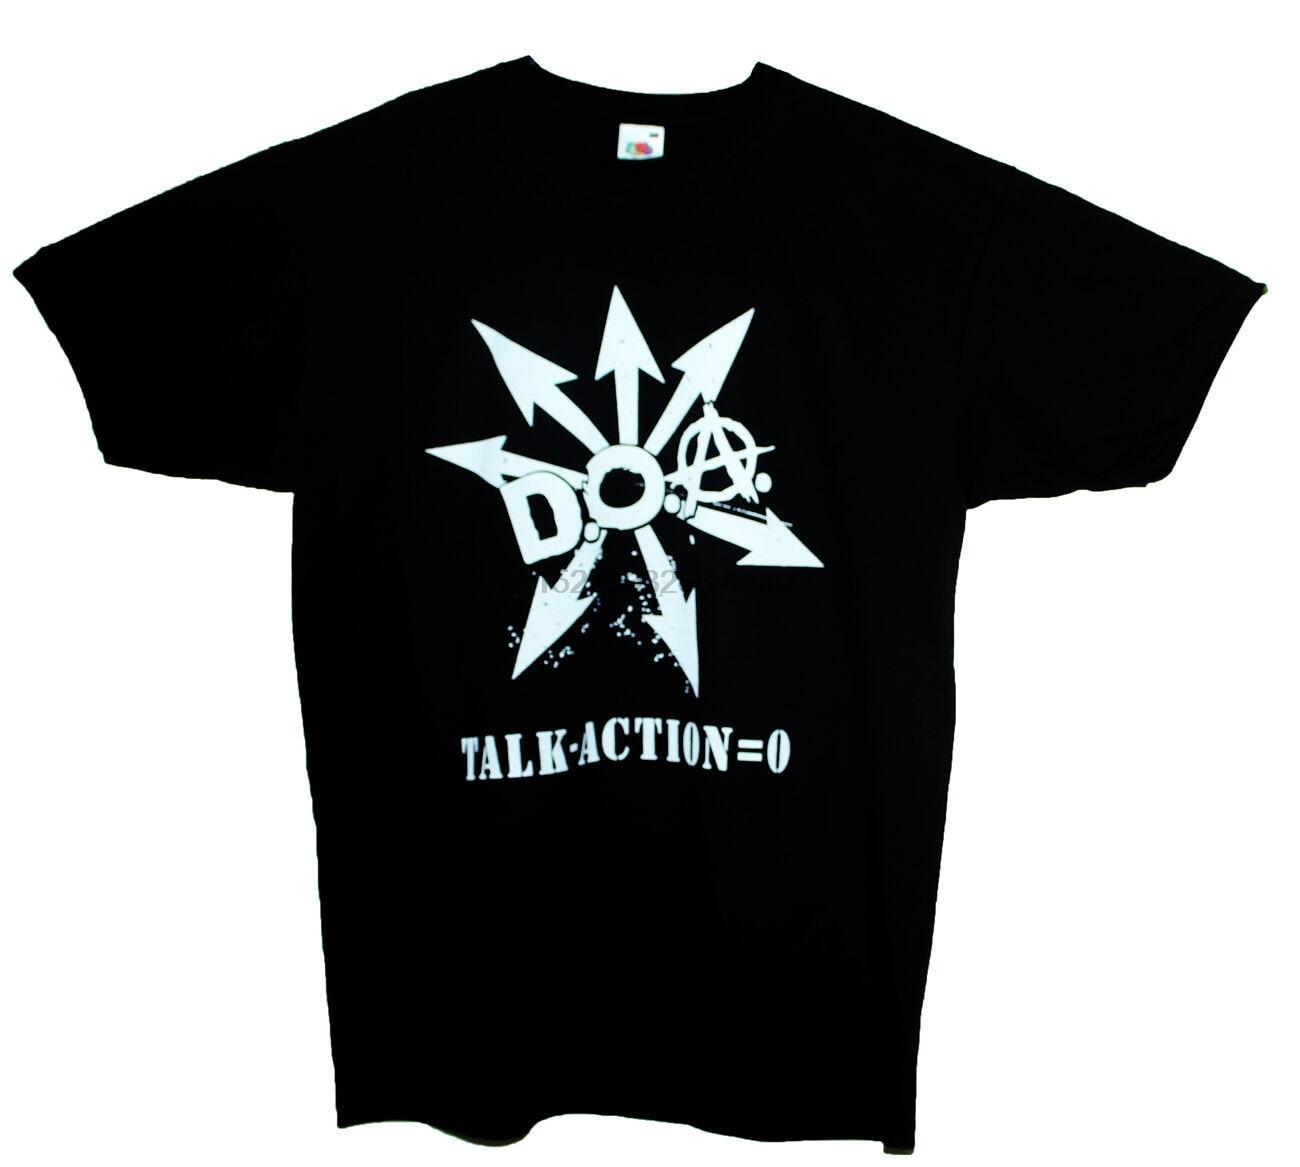 DOA Camiseta Anarcho Punk Rock germen Bandera Negra banda política gráfico Tee